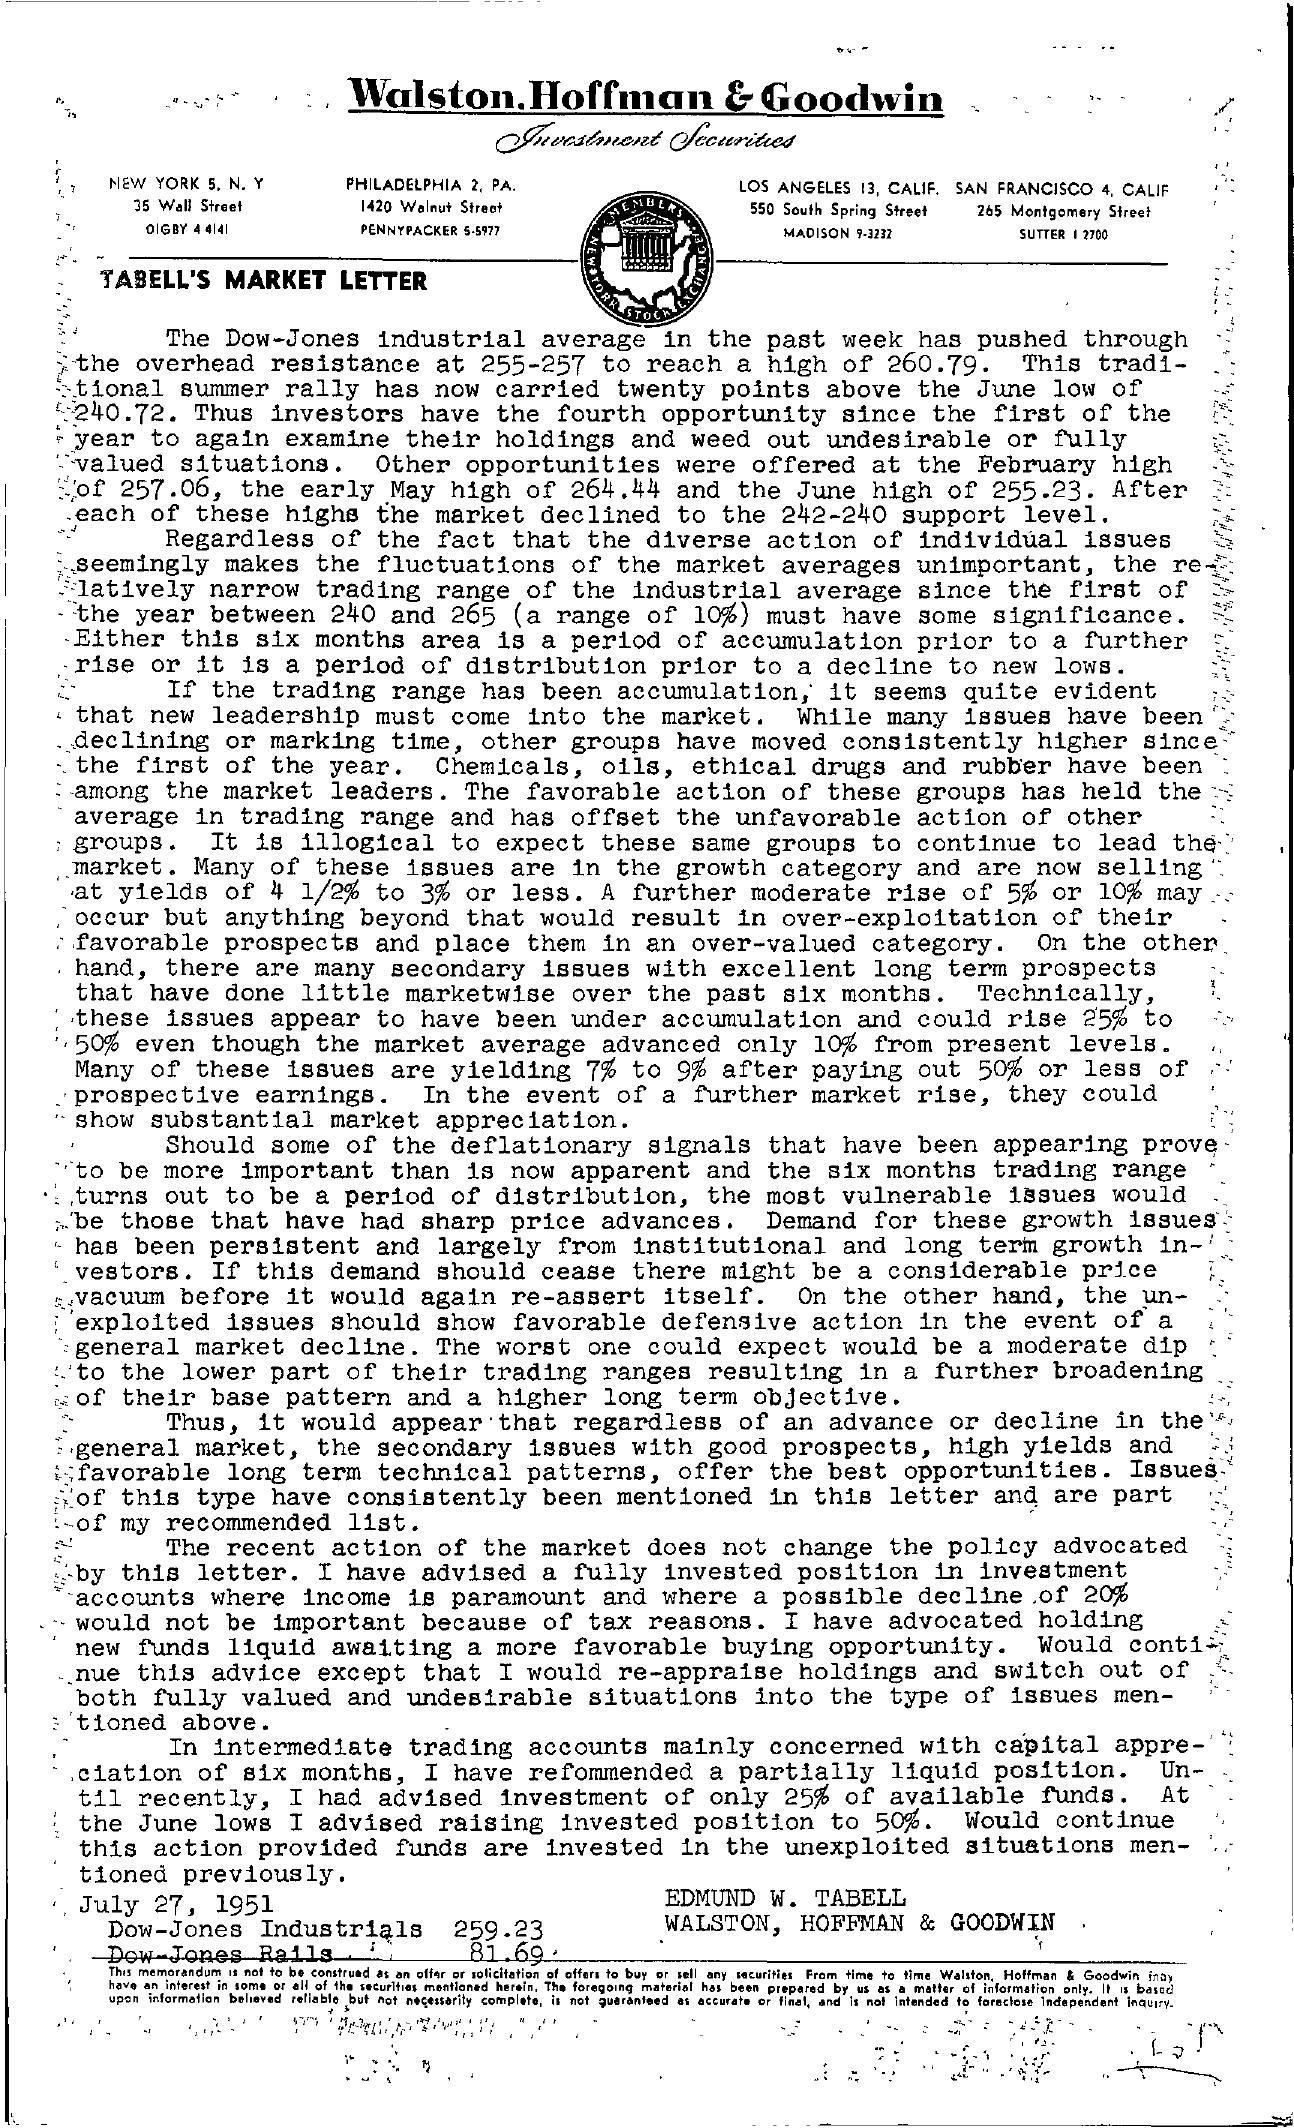 Tabell's Market Letter - July 27, 1951